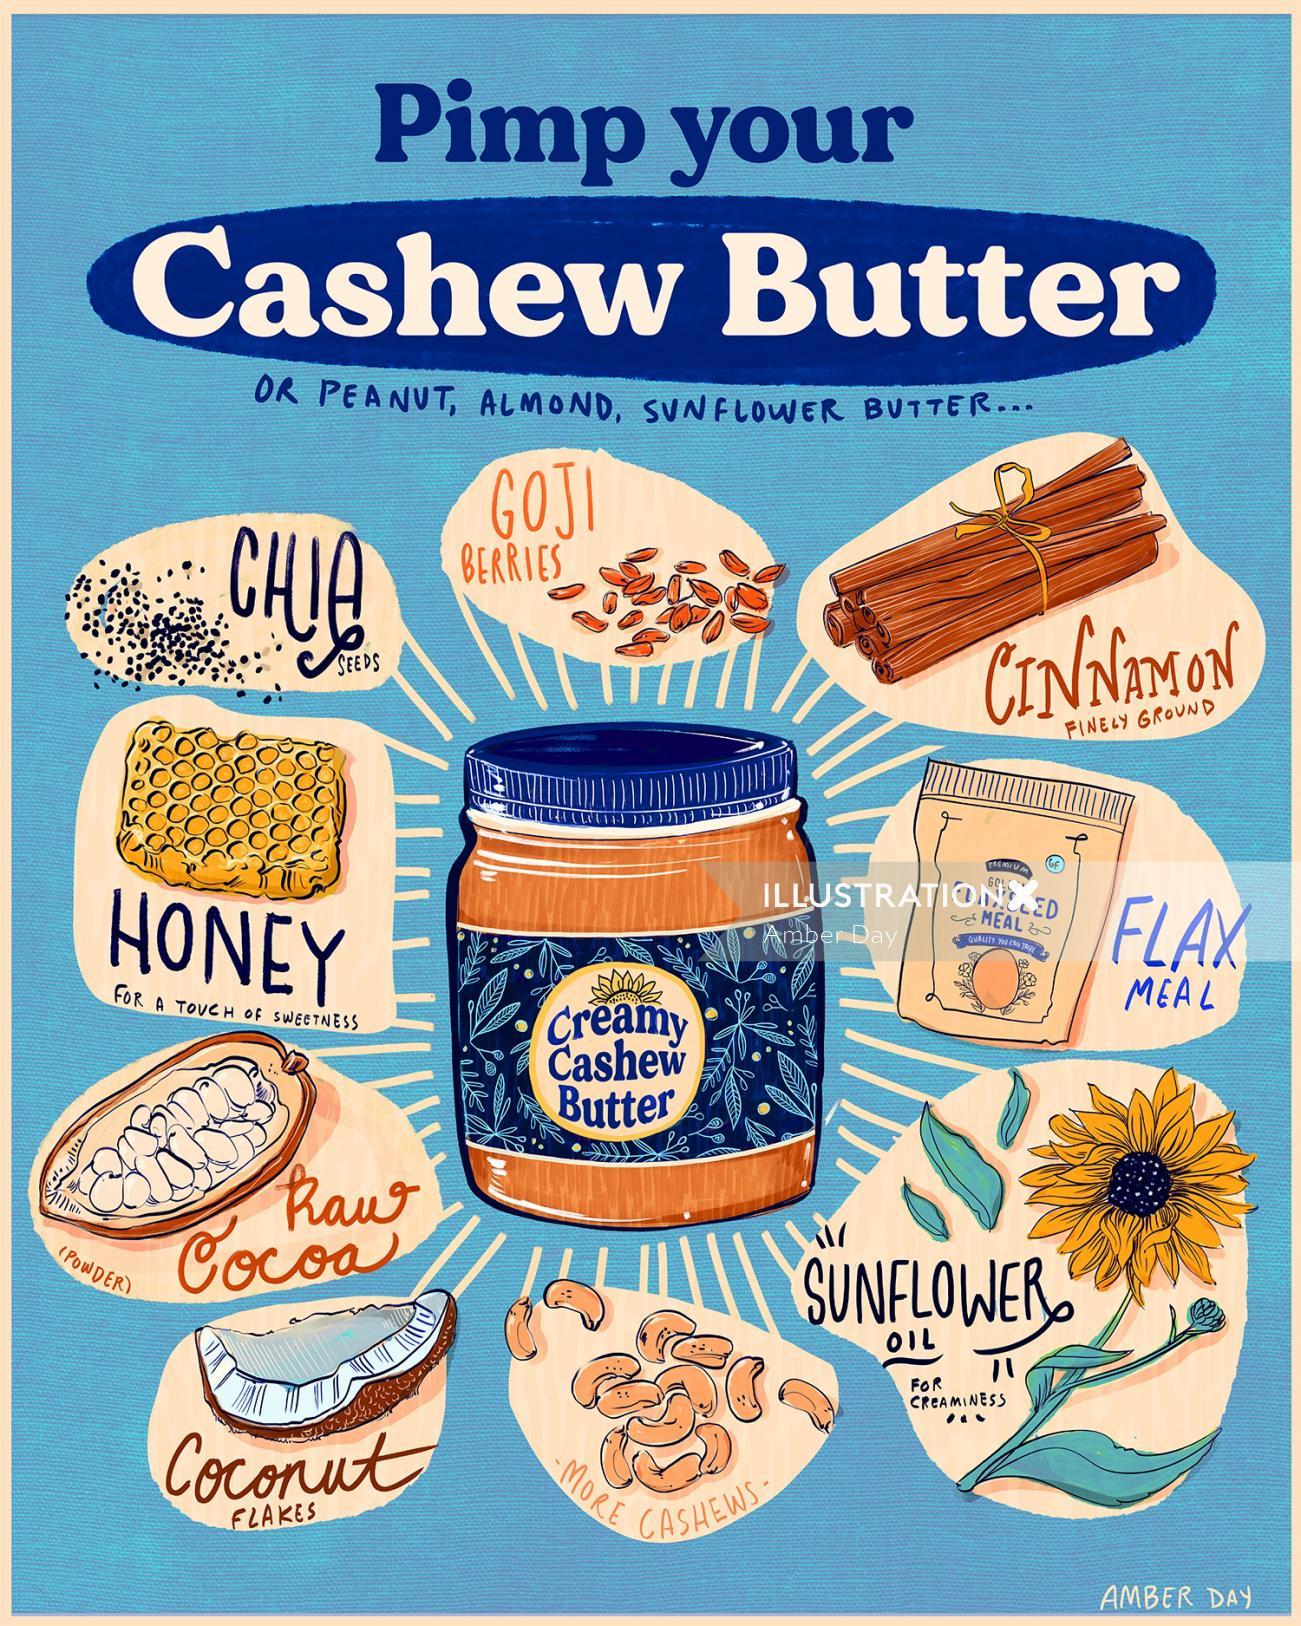 bright, fun, bold, colorful, inspirational, happy, recipe, nut, cashew, butter, honey, coconut, caca